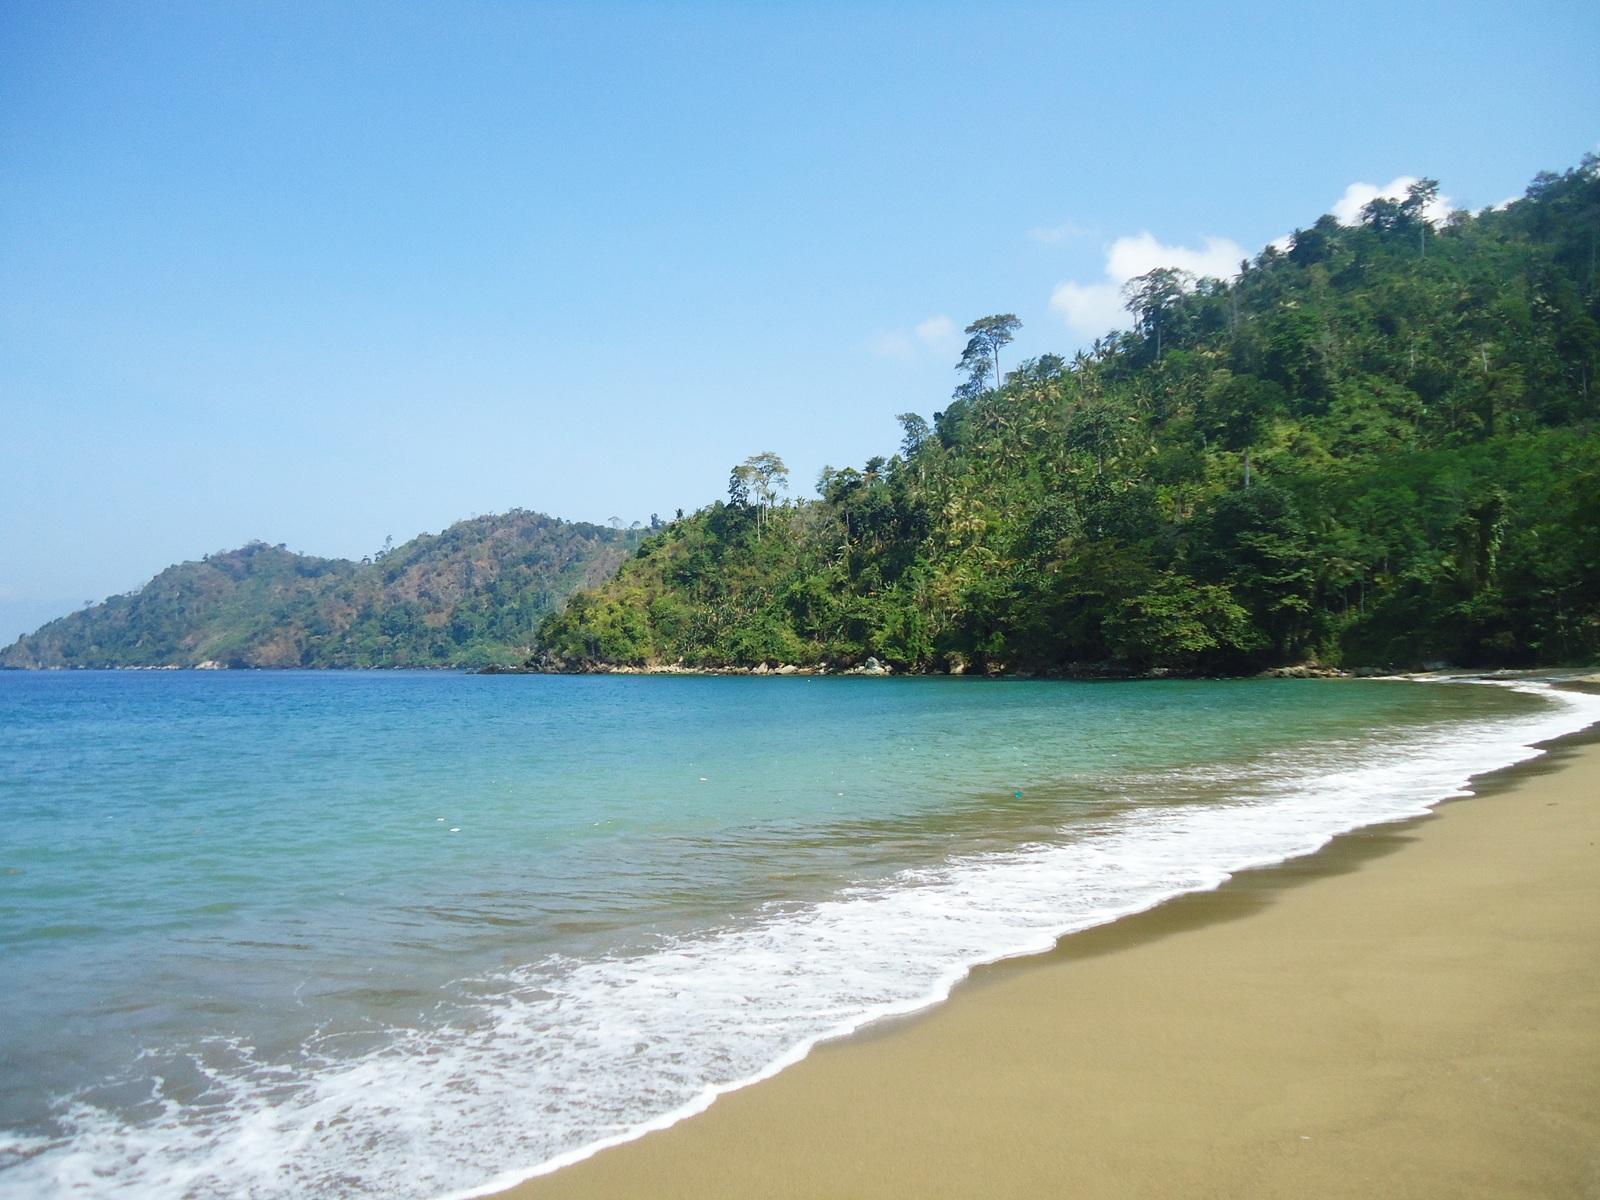 27 Wisata Pantai Hits Malang Deketin Sipelot Teluk Bidadari Mbehi